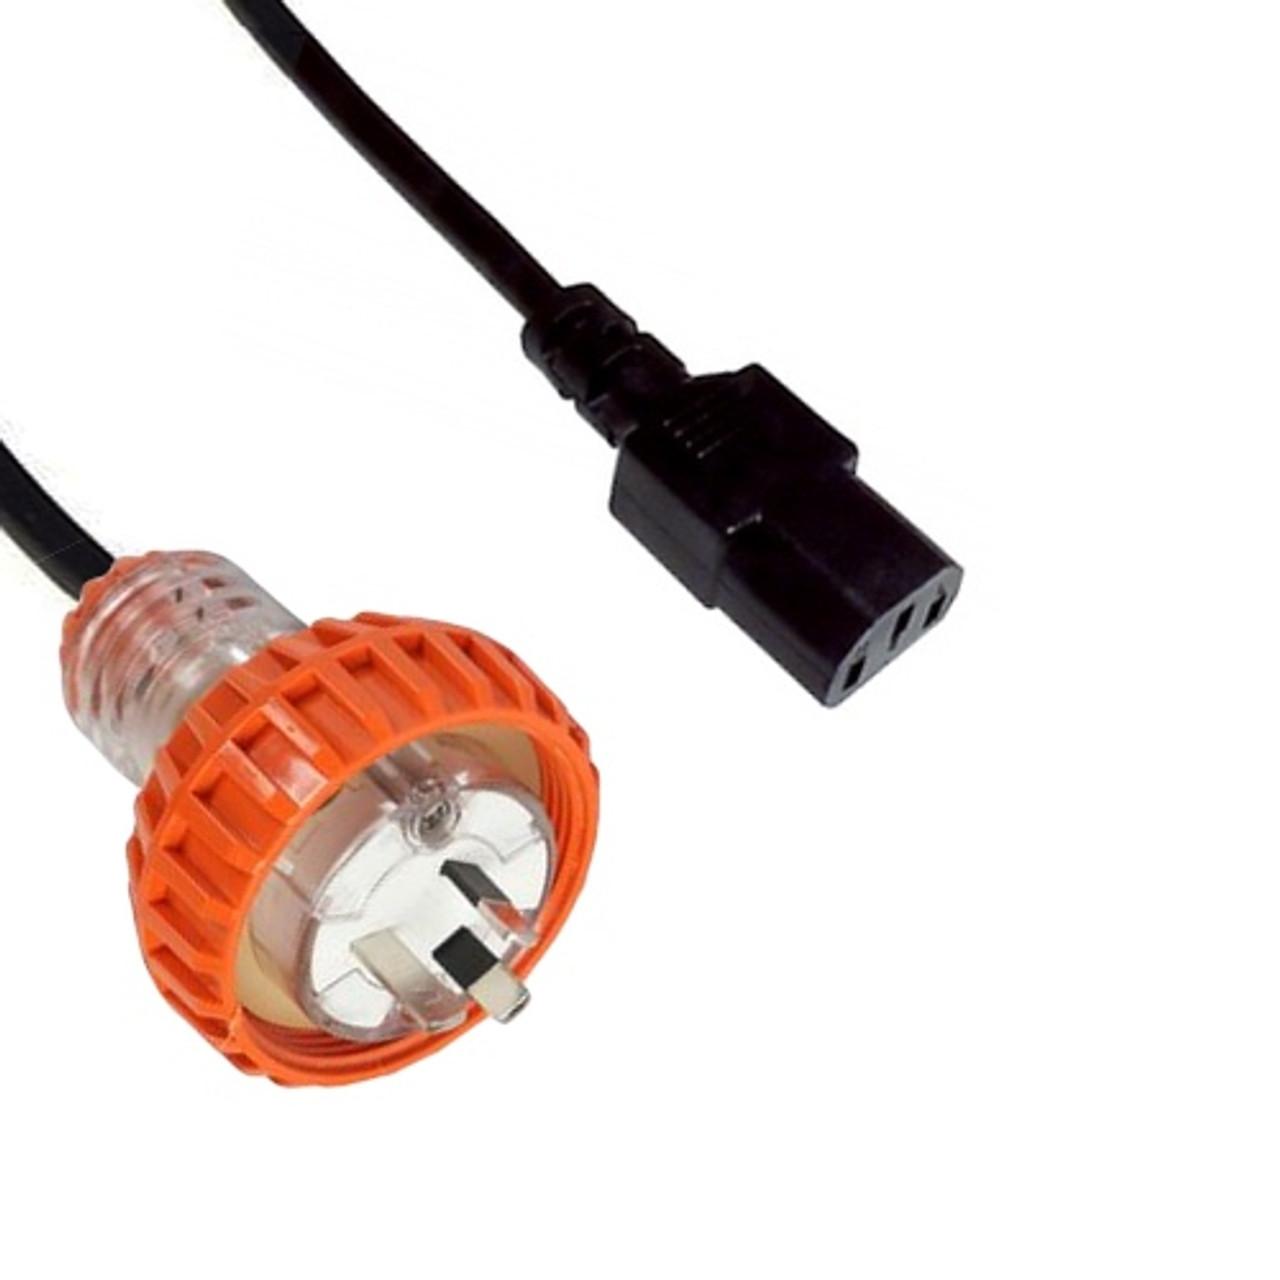 Custom Cable: Captive 10A plug - IEC (60320) C13 10A socket, Black lead